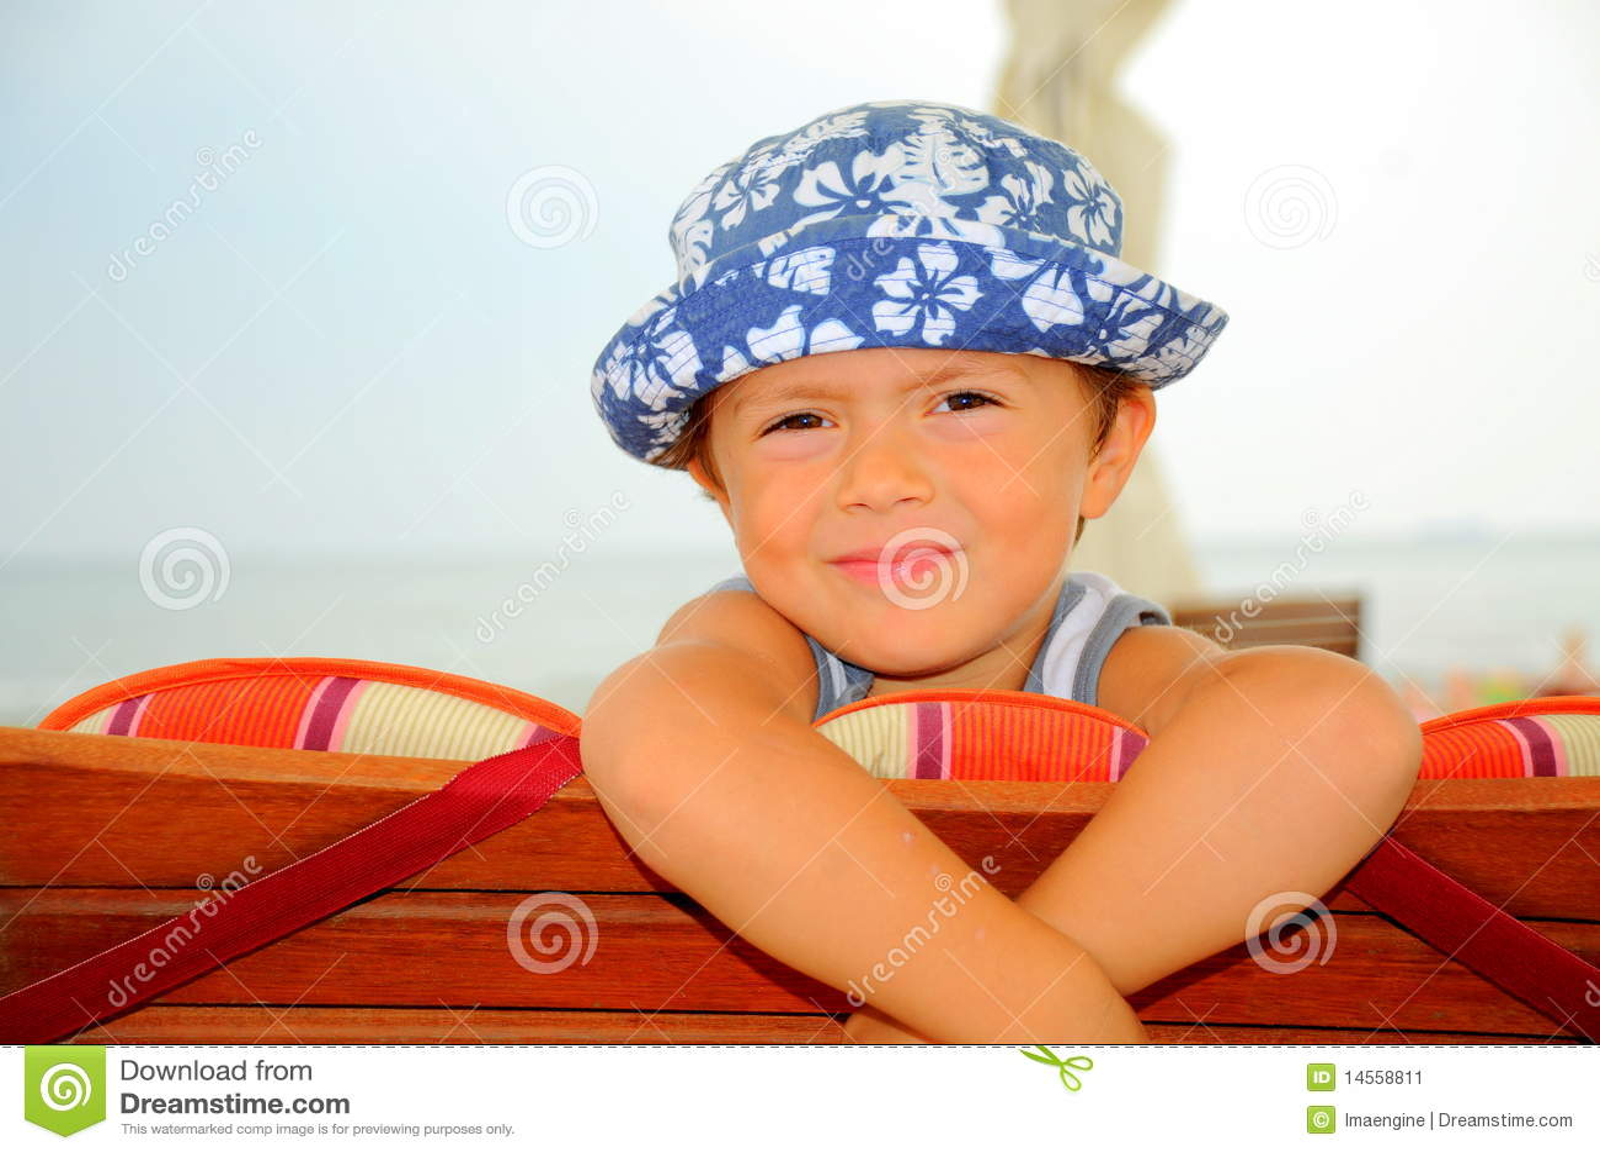 Popoye the sailor (boy portrait)